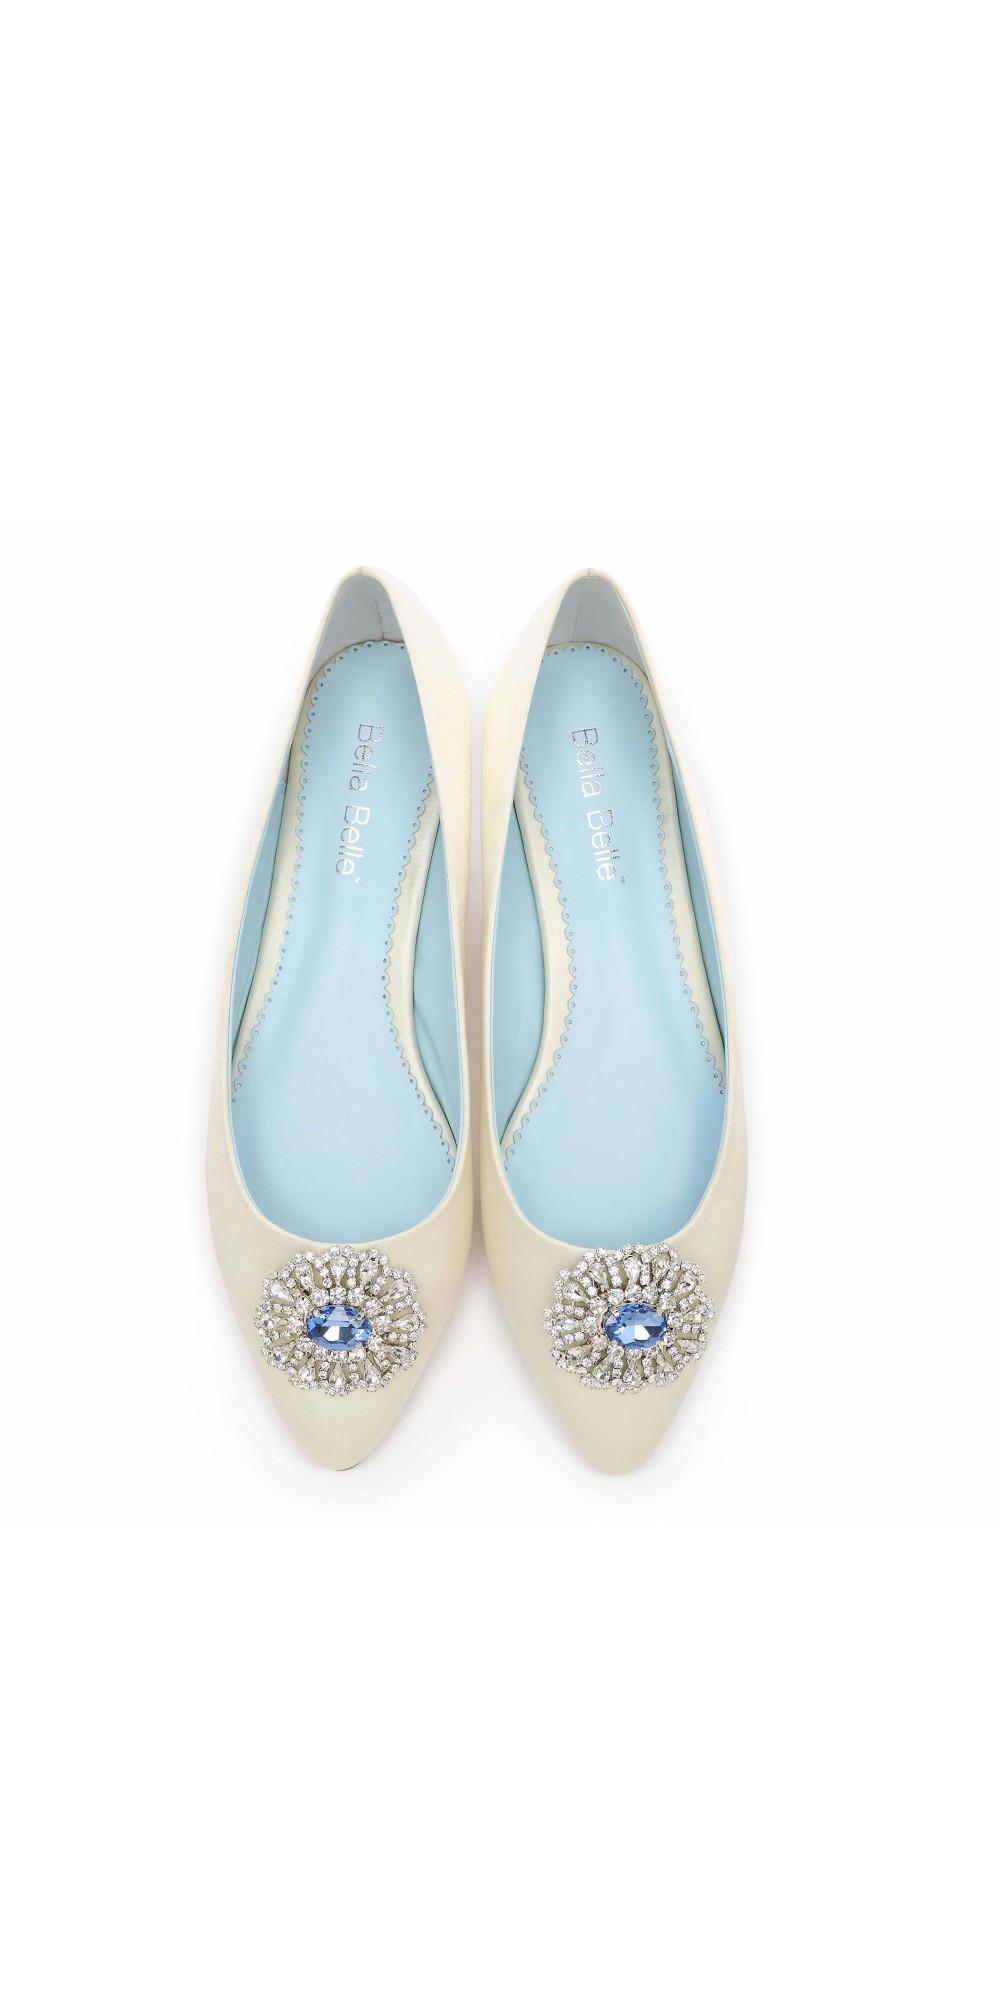 Vintage Style Wedding Shoes, Boots, Flats, Heels Jackie Bridal Flats $289.00 AT vintagedancer.com